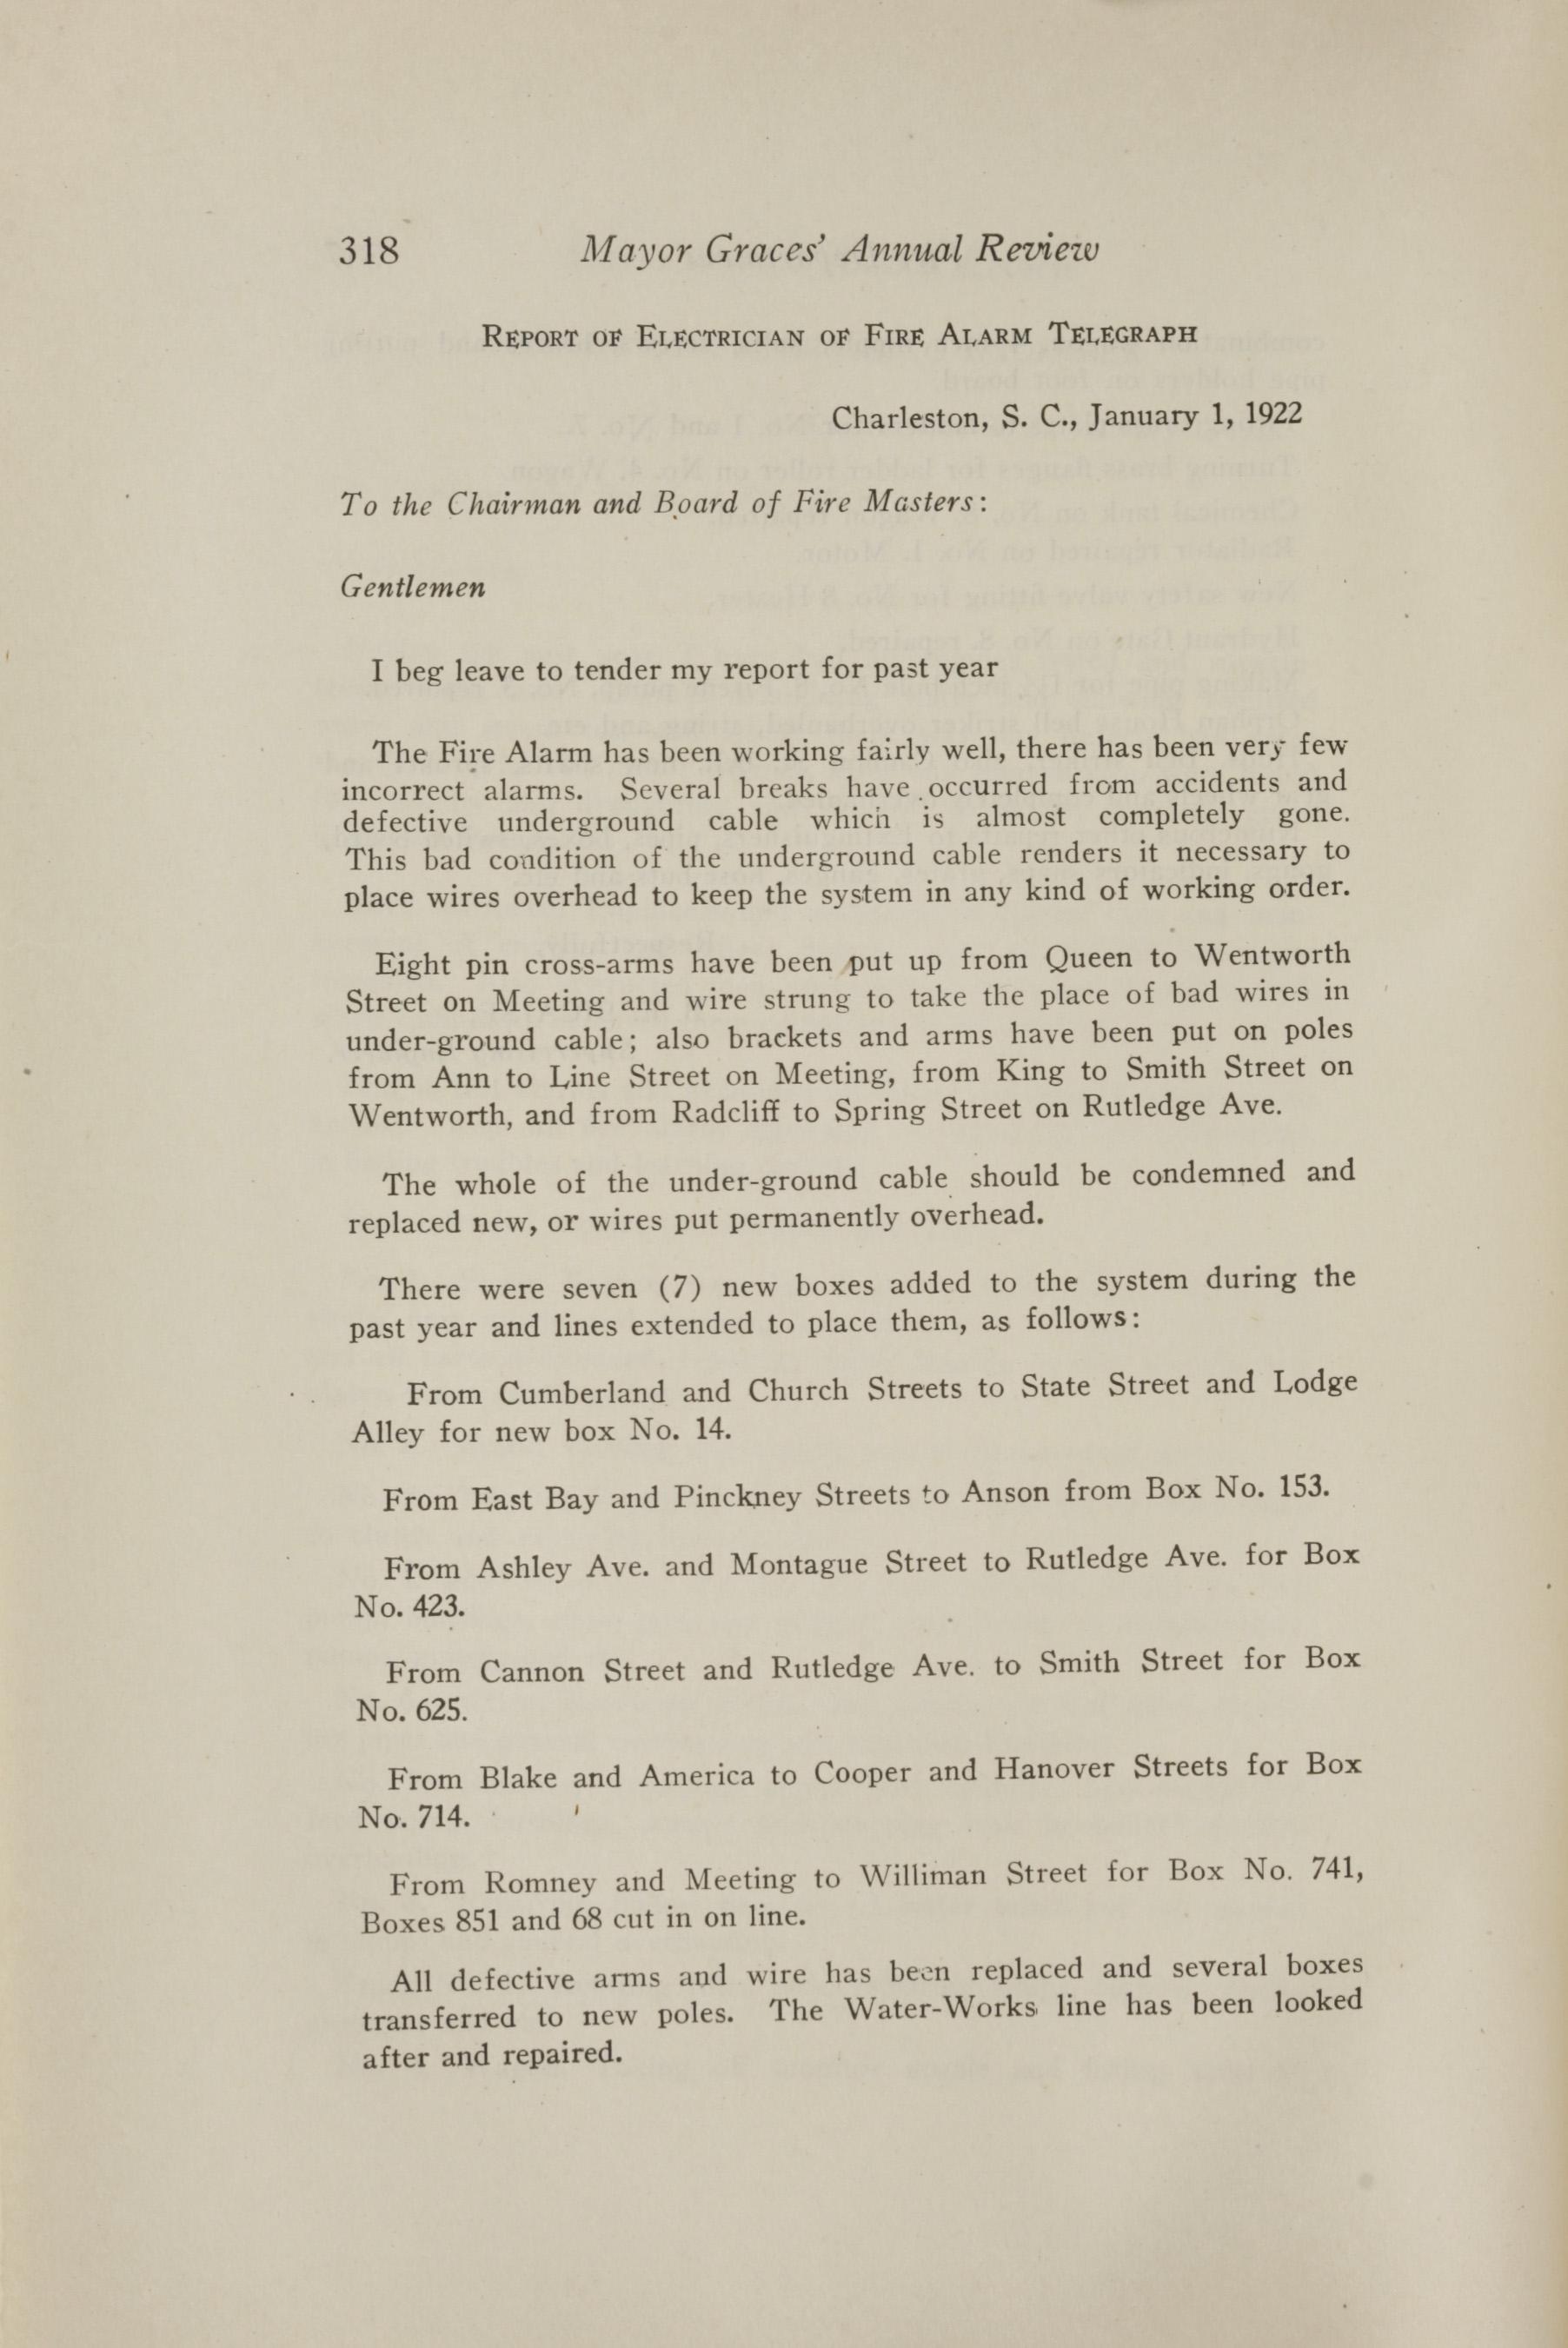 Charleston Yearbook, 1921, page 318